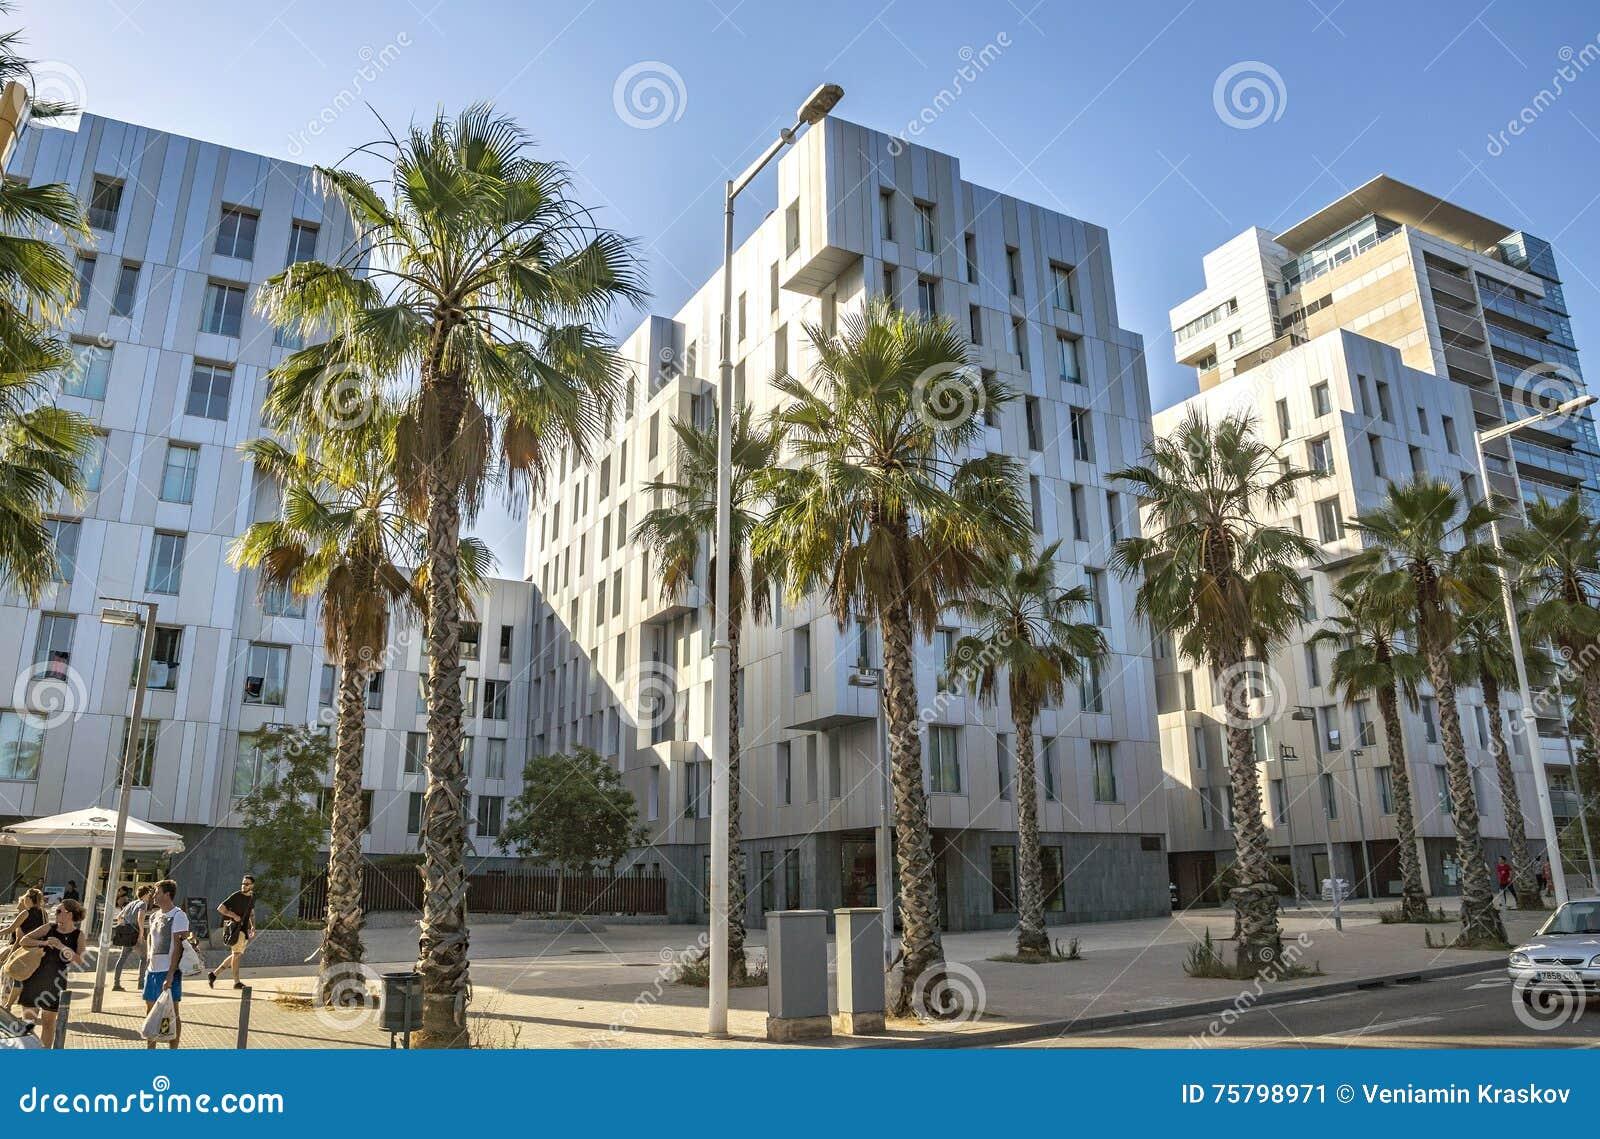 Architecture Poblenou district in Barcelona